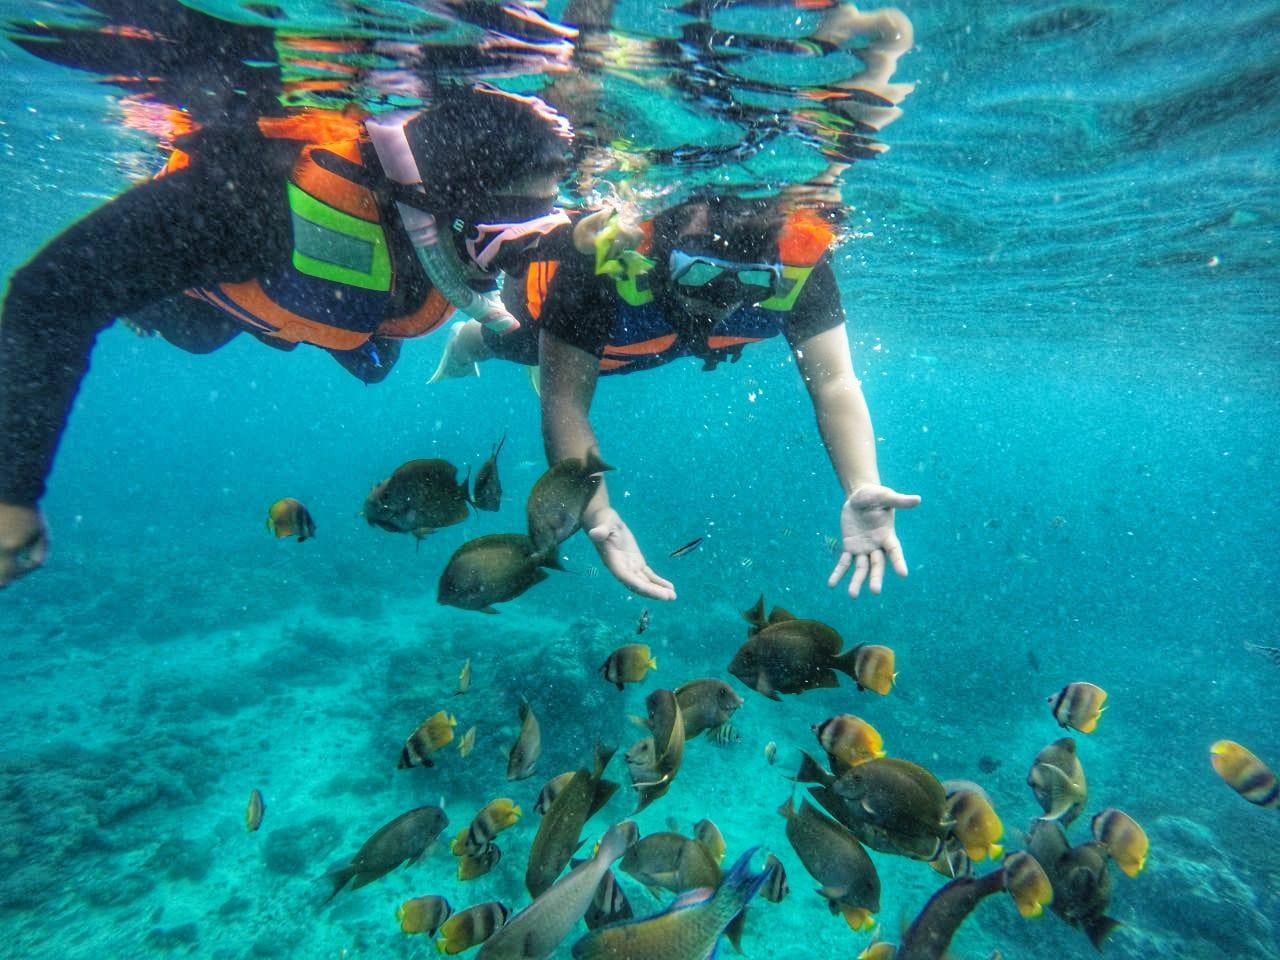 Paket Tour Nusa Penida & Tour Snorkeling Murah